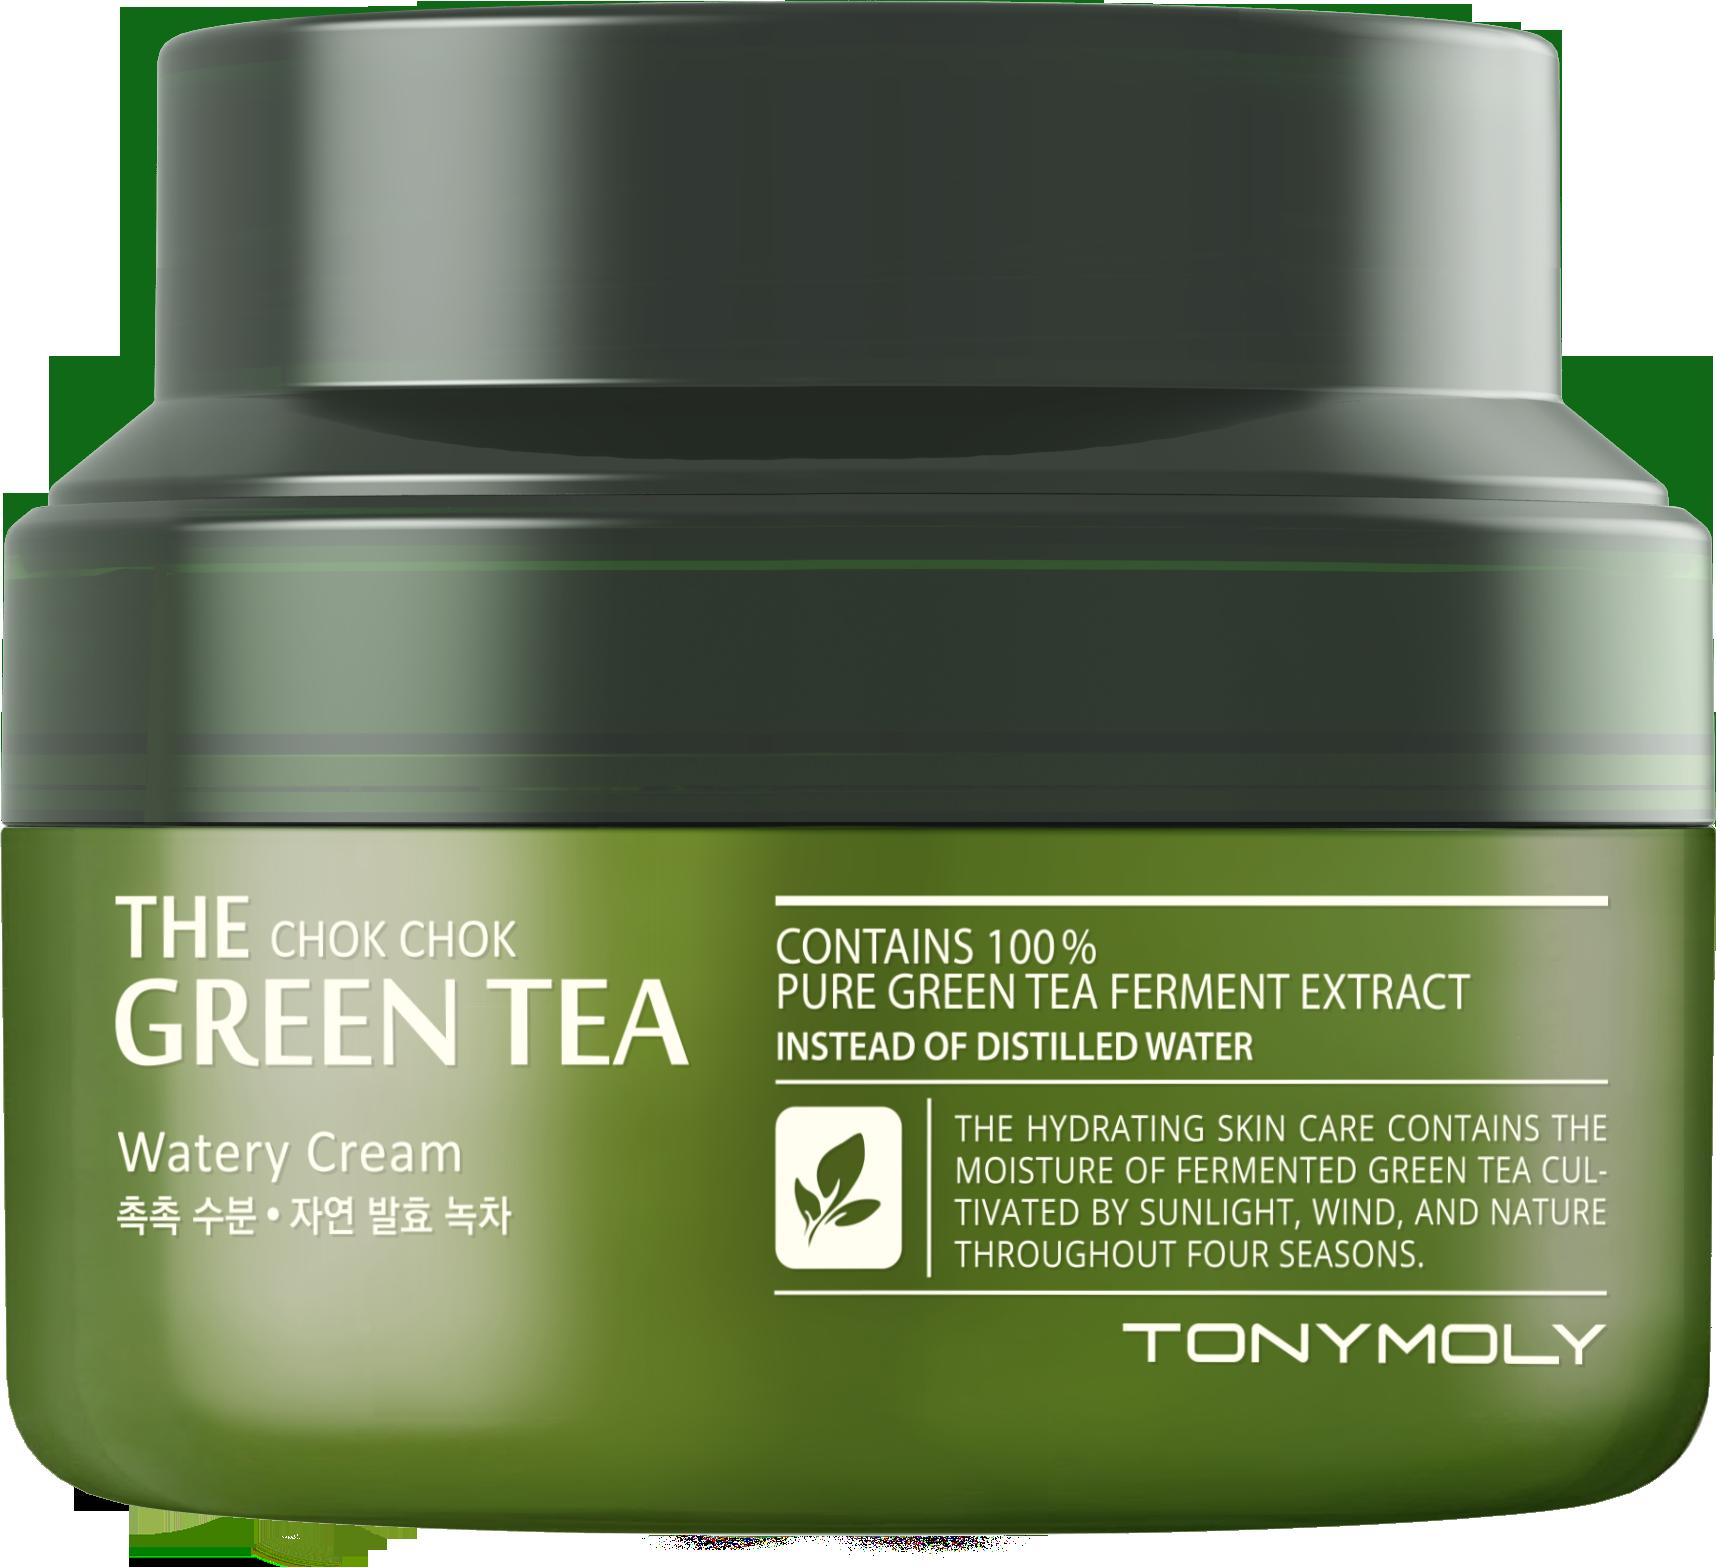 TONYMOLY Крем для лица / The Chok Chok Green Tea Watery Cream2 60 мл tony moly крем с экстрактом зеленого чая the chok chok green tea watery cream 60 мл